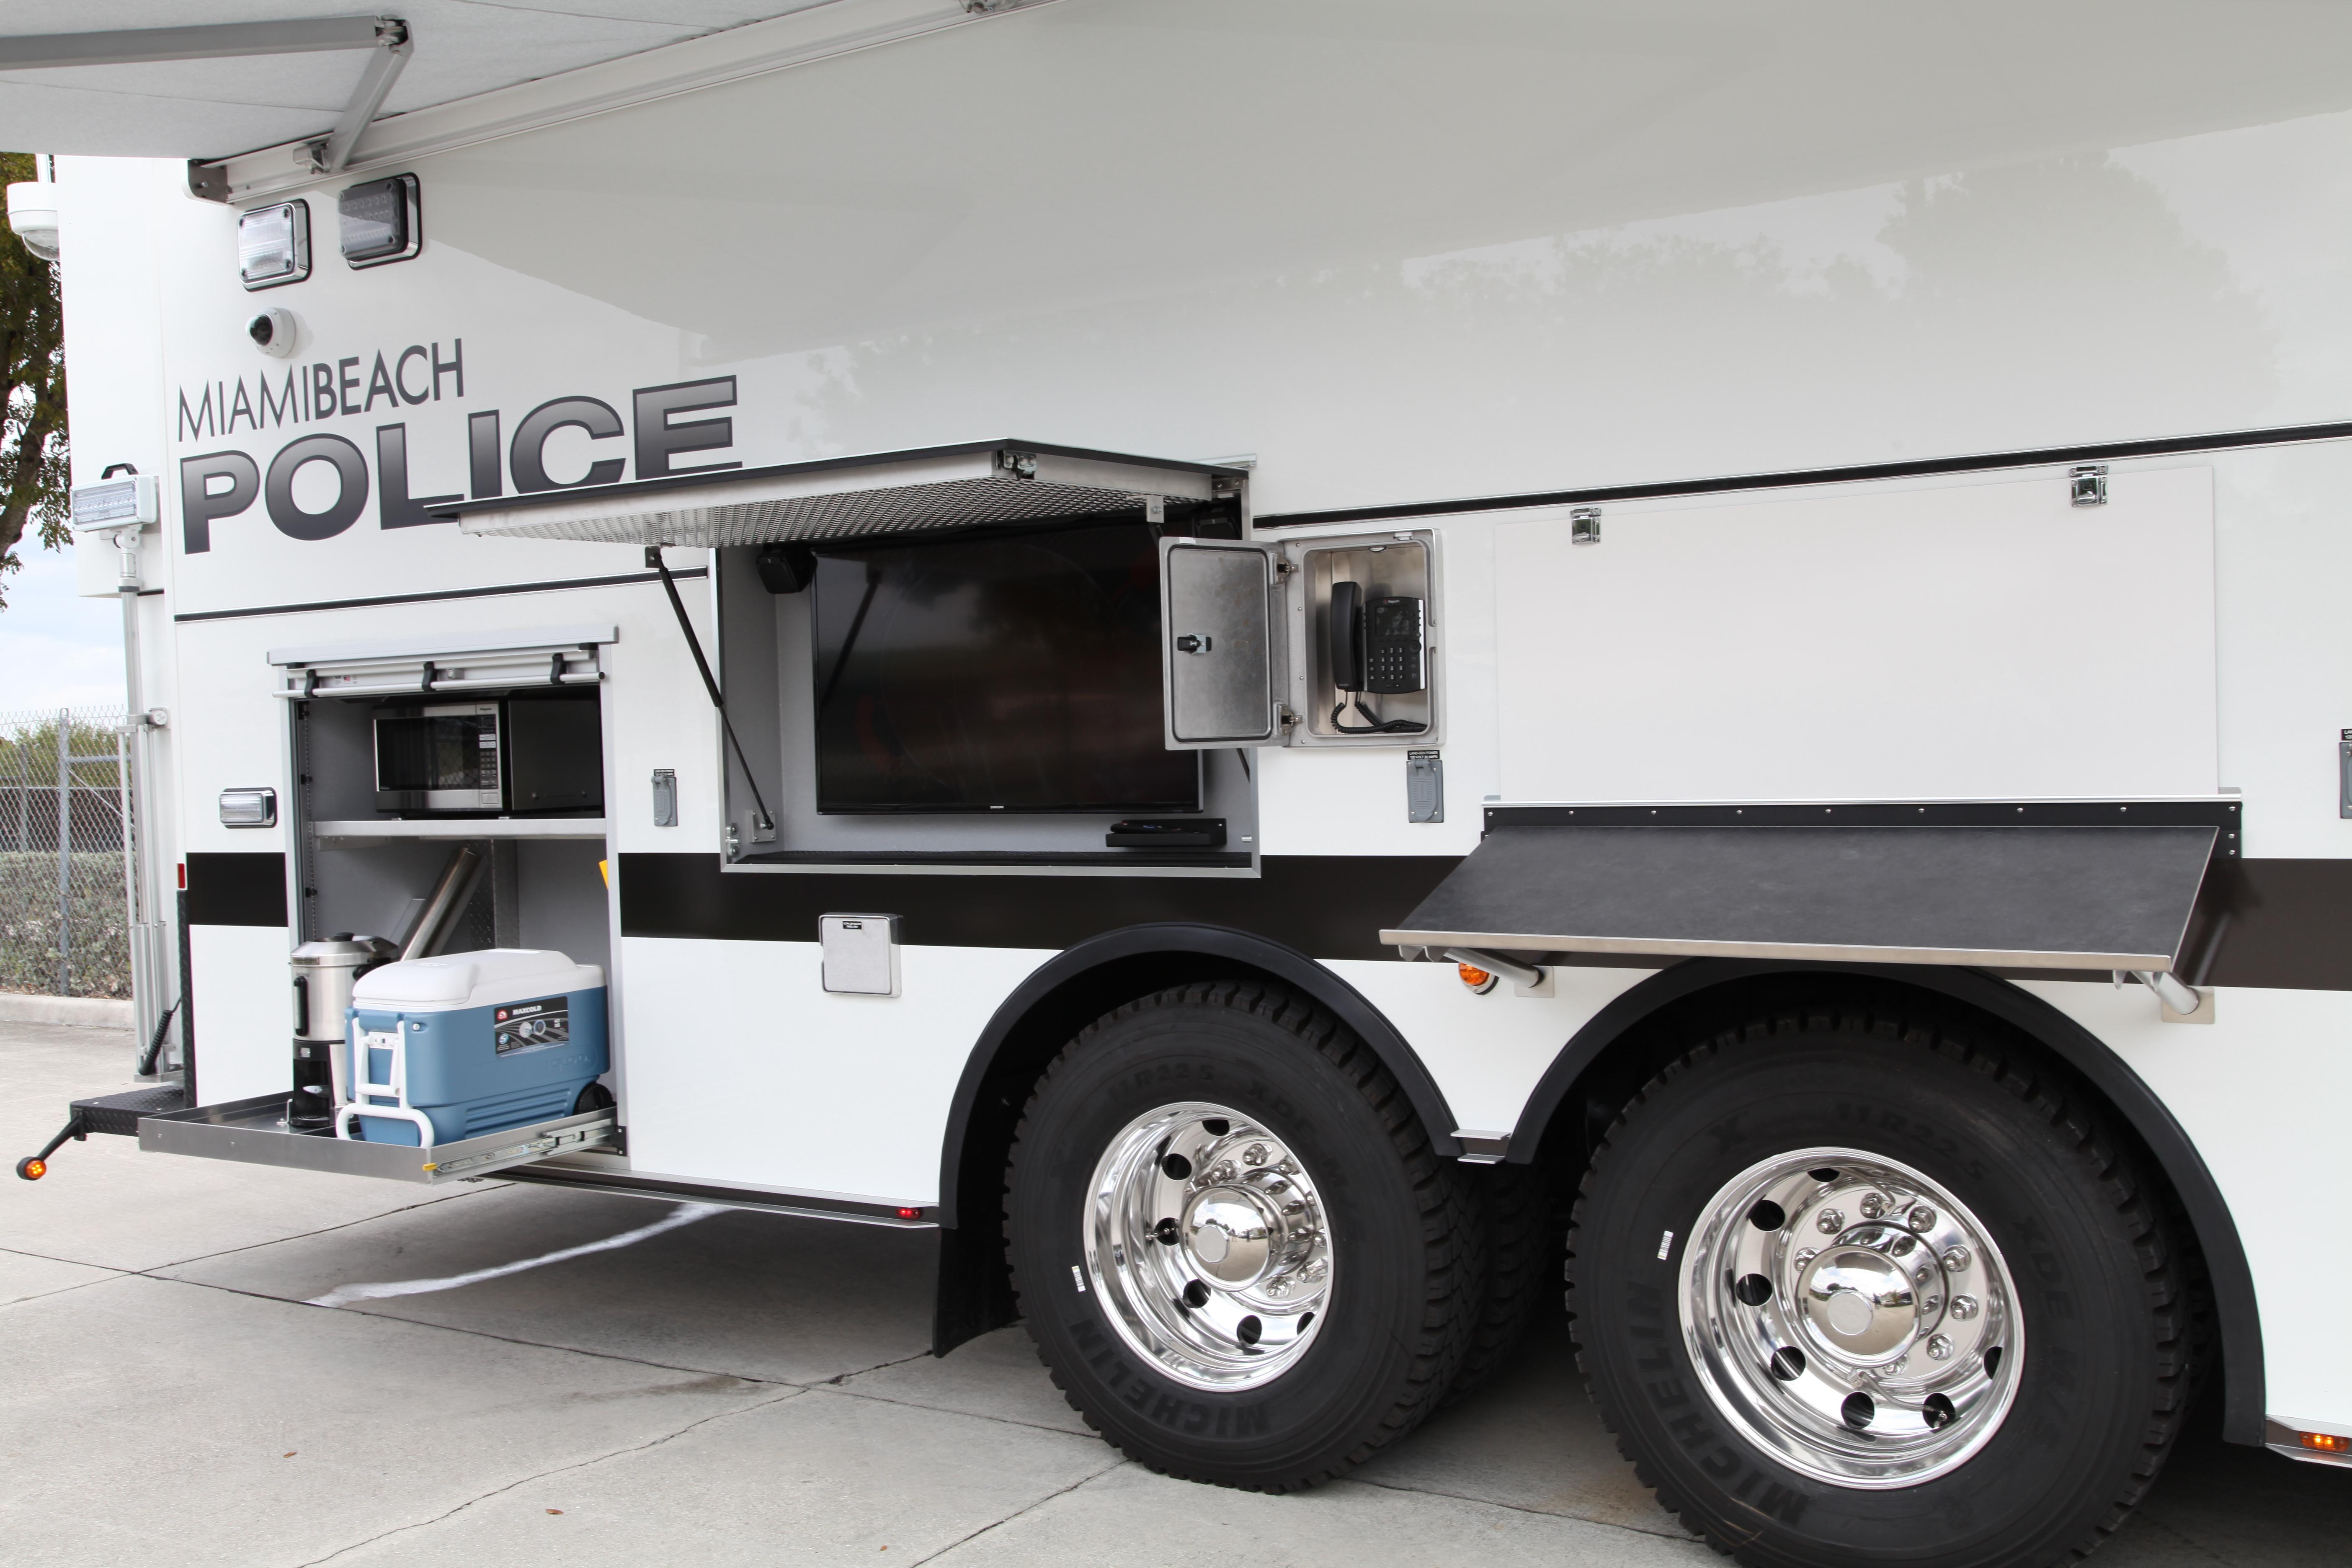 34-Ft. Command Vehicle